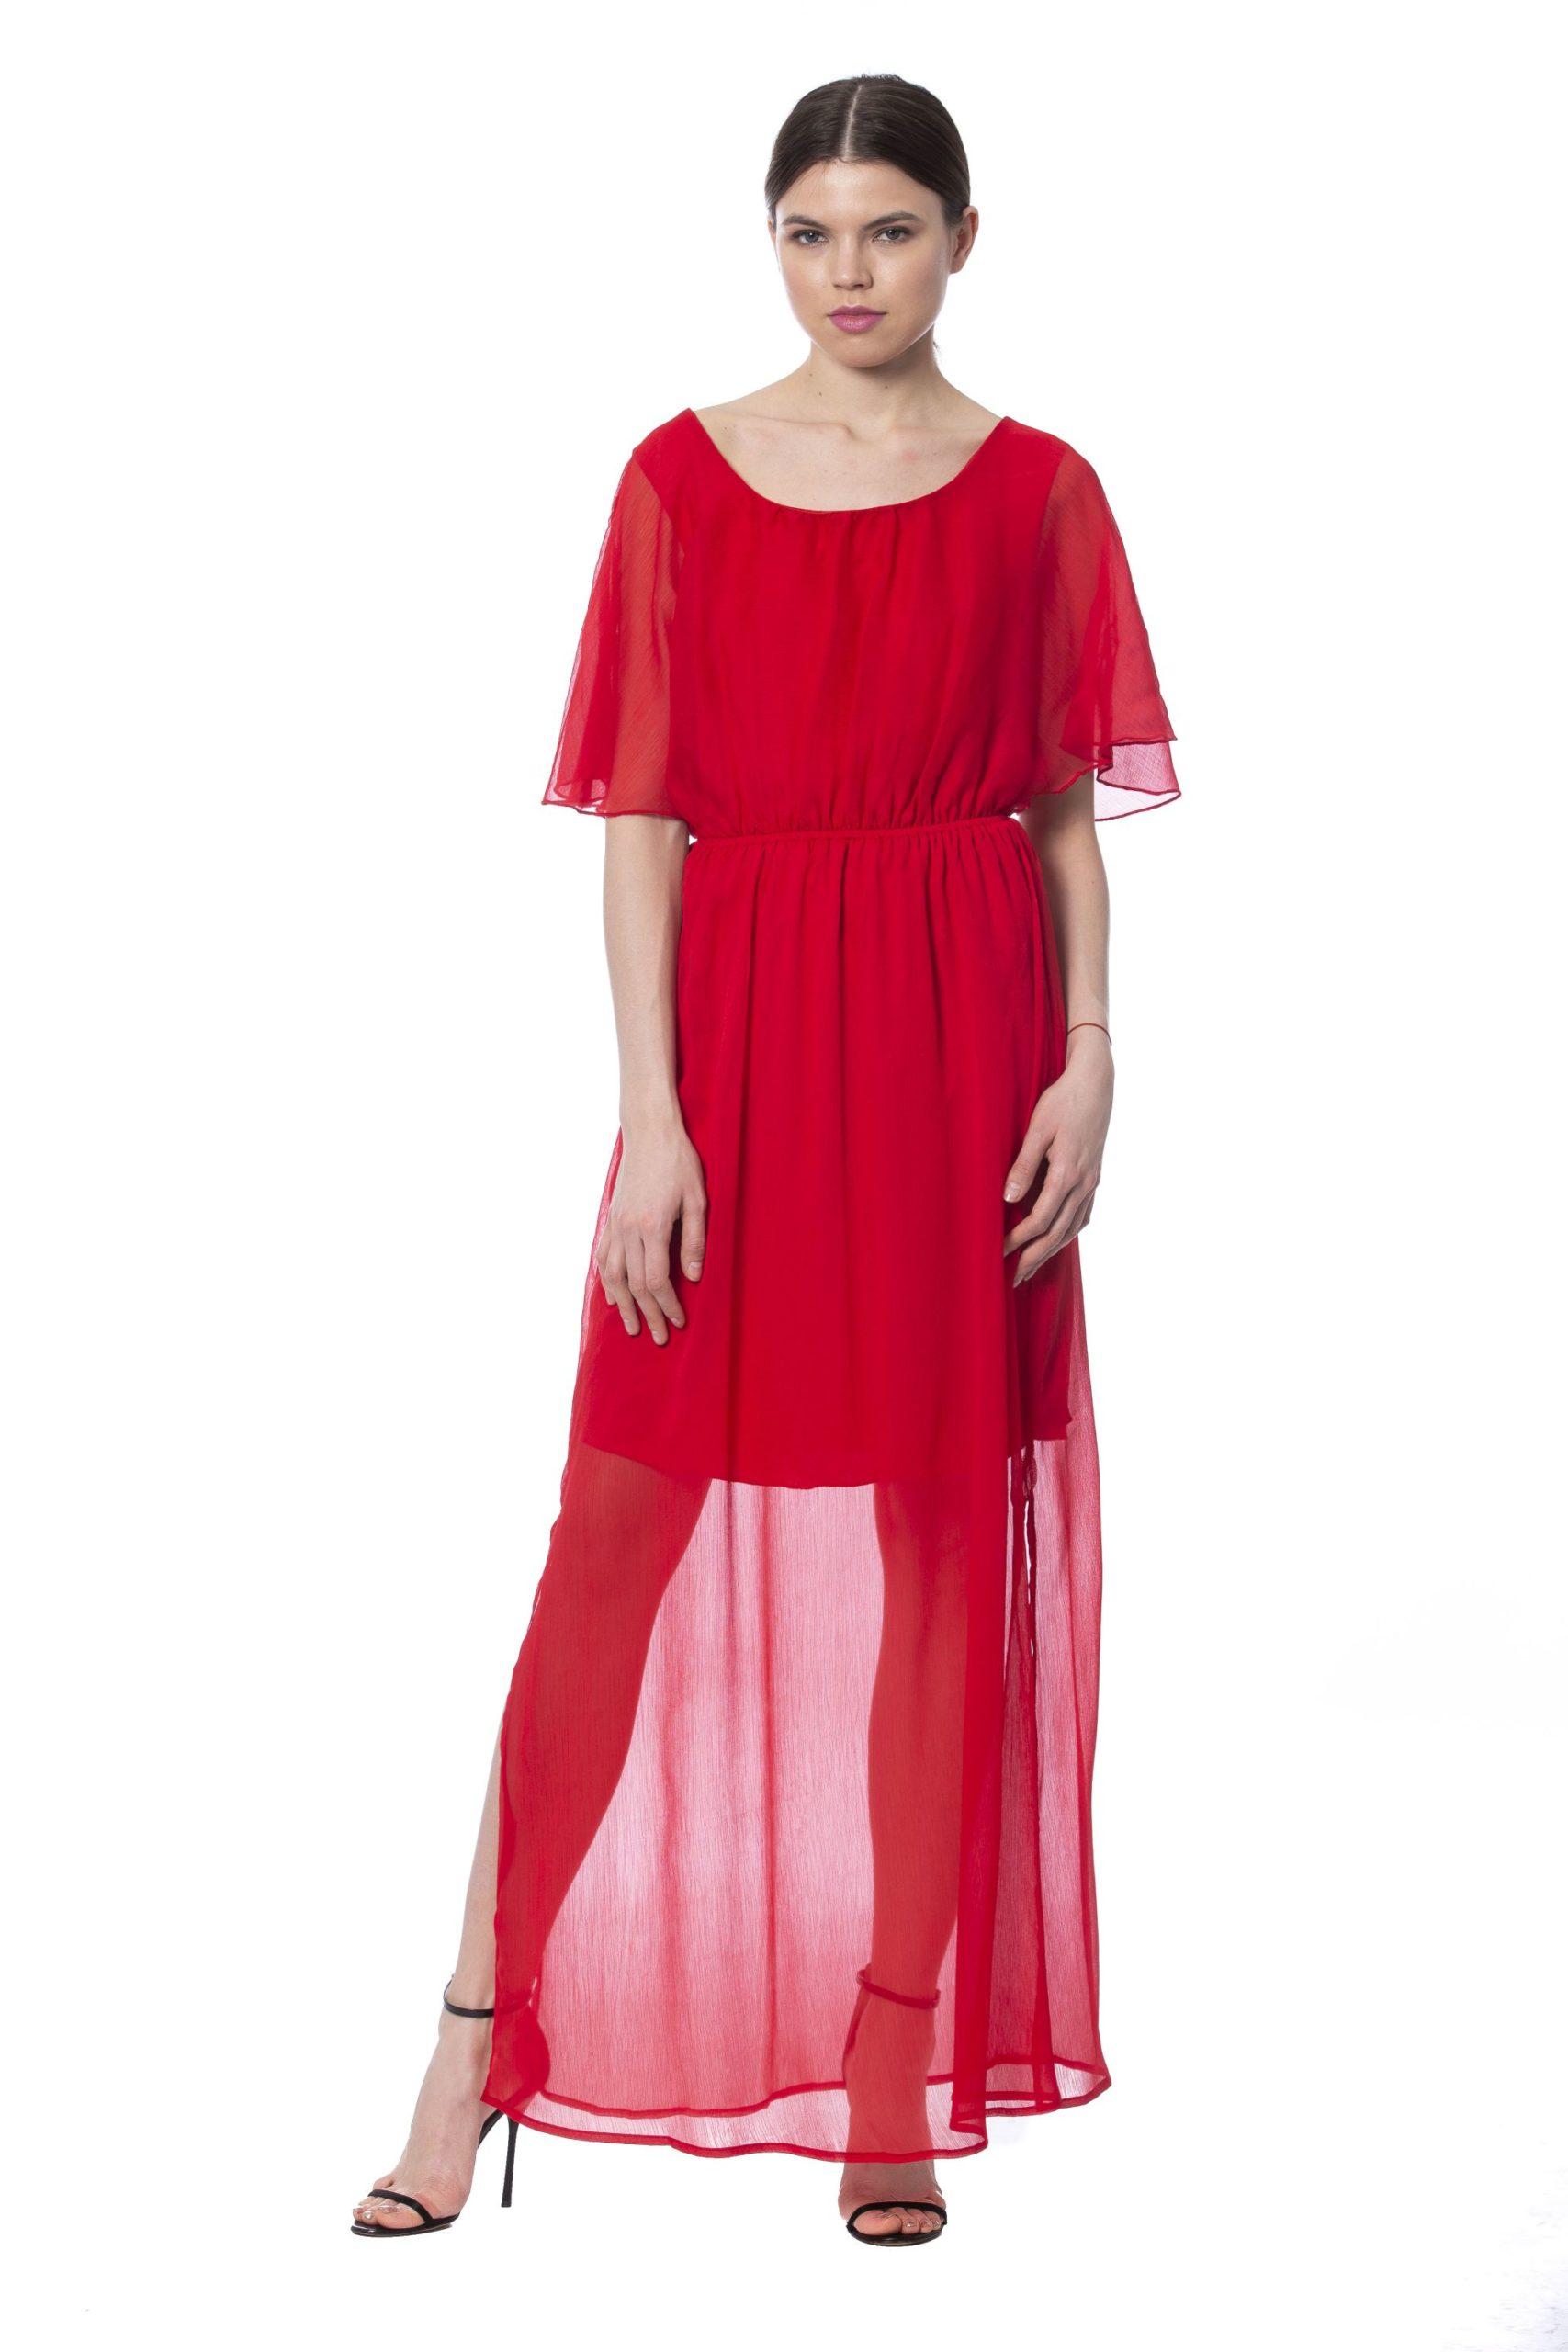 Silvian Heach Women's Dress Red SI996388 - L